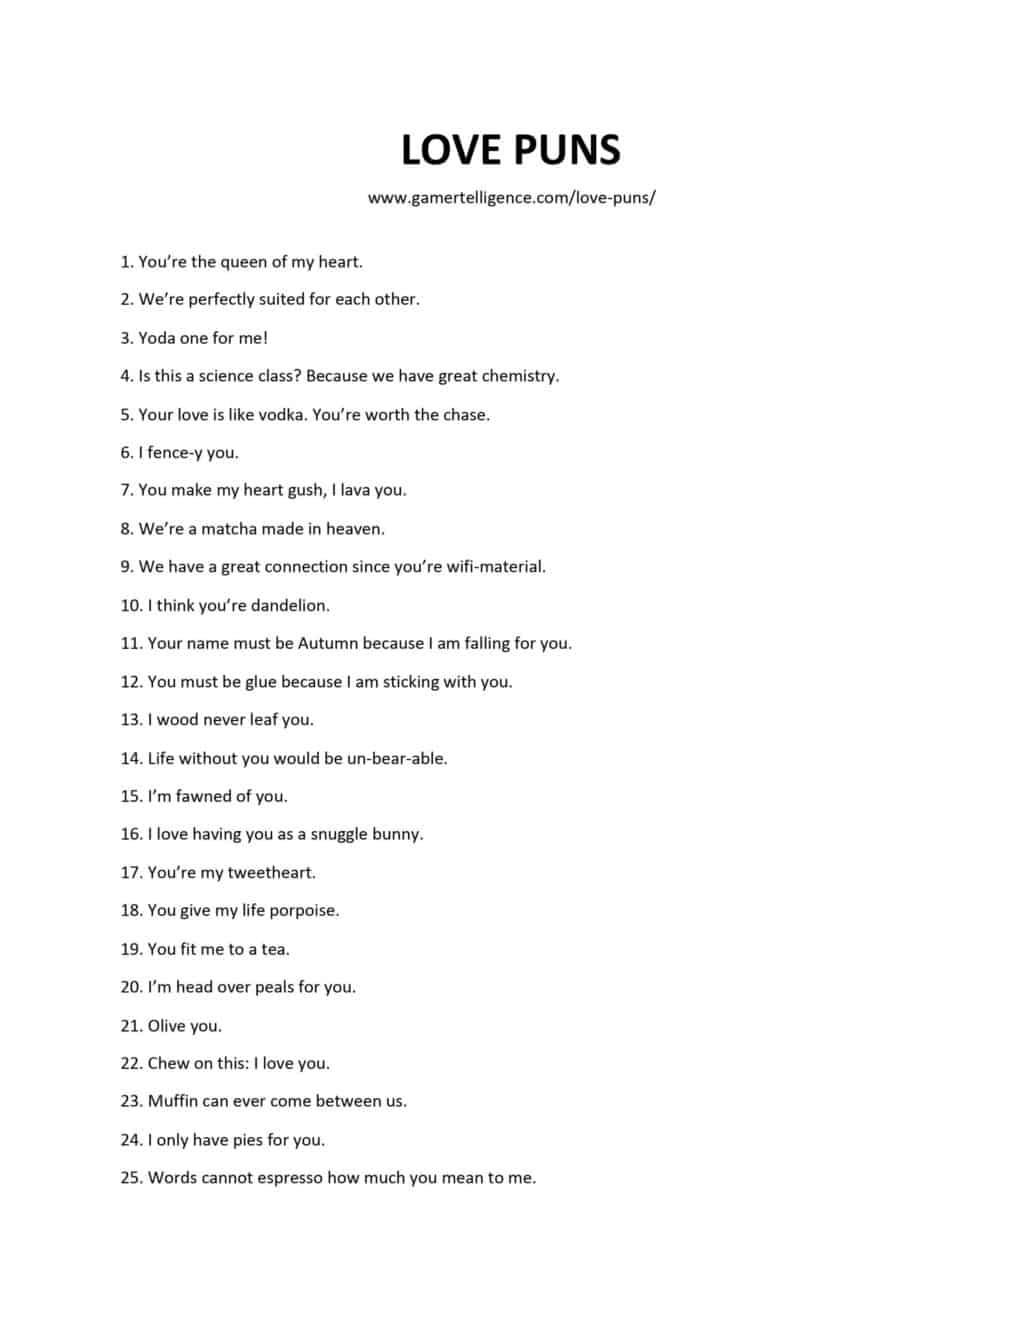 Downloadable and printable list as pdf or jpg